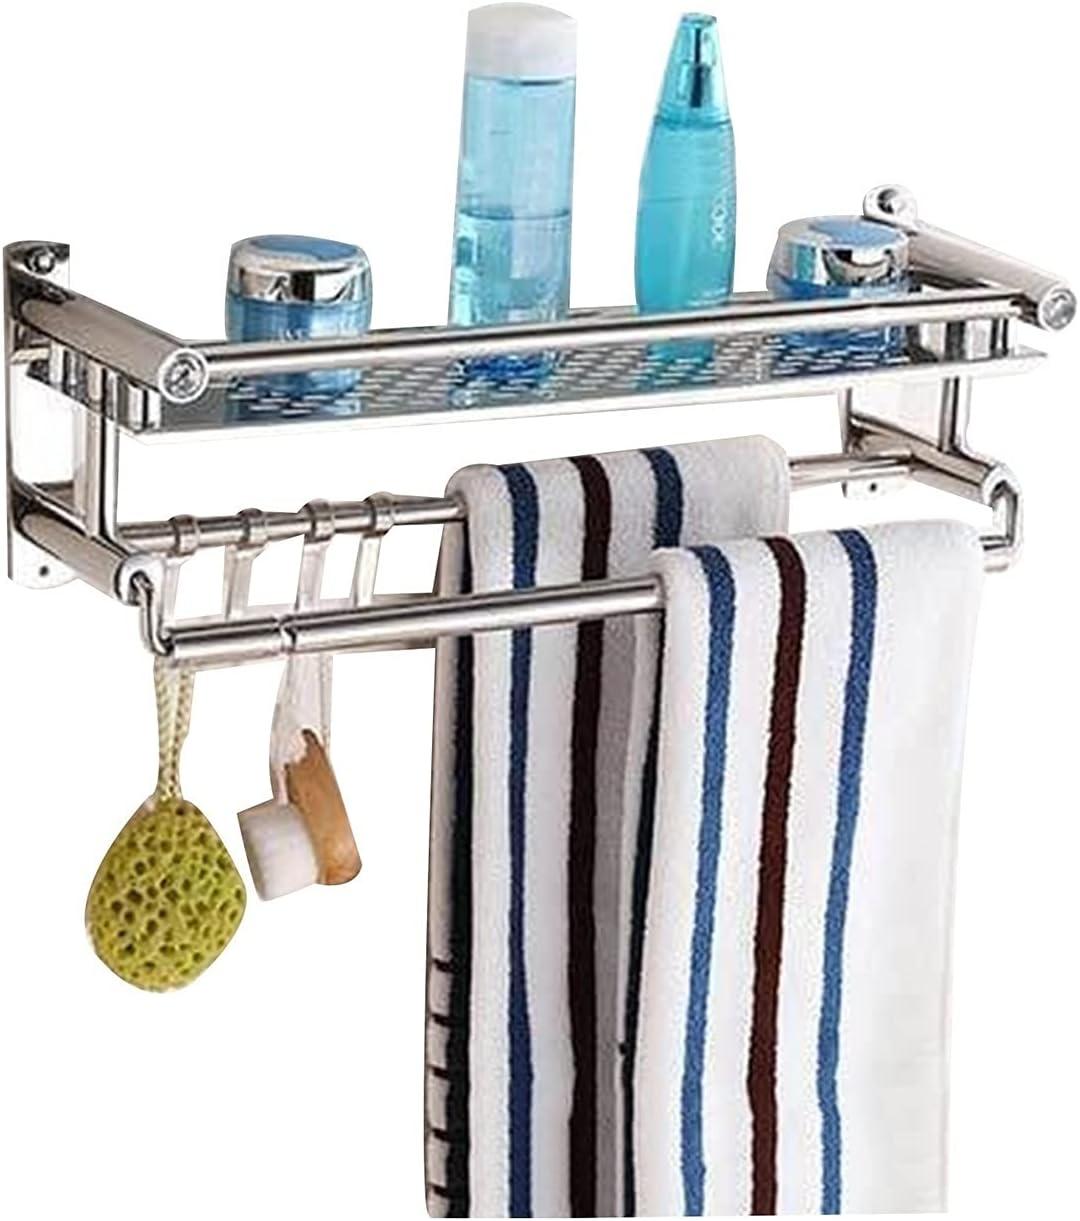 Yingbao Bathroom Stainless Steel Memphis Mall Shelf Genuine Wall-Moun Bar Towel with